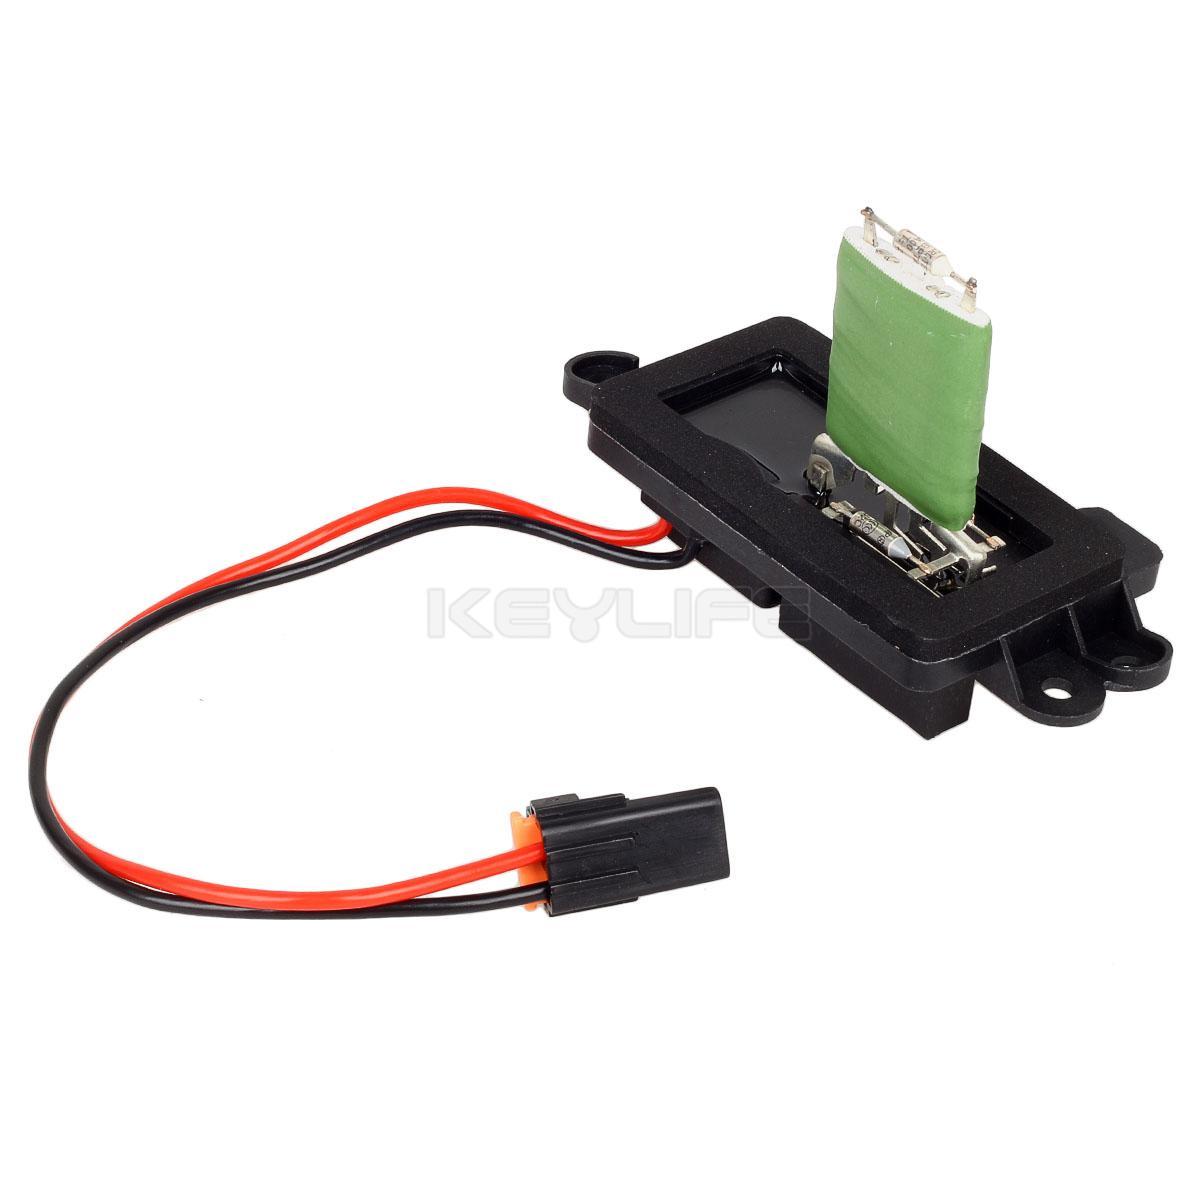 HVAC Blower Motor Resistor w// Wire Harness For 02-05 Chevrolet Blazer # 89019088